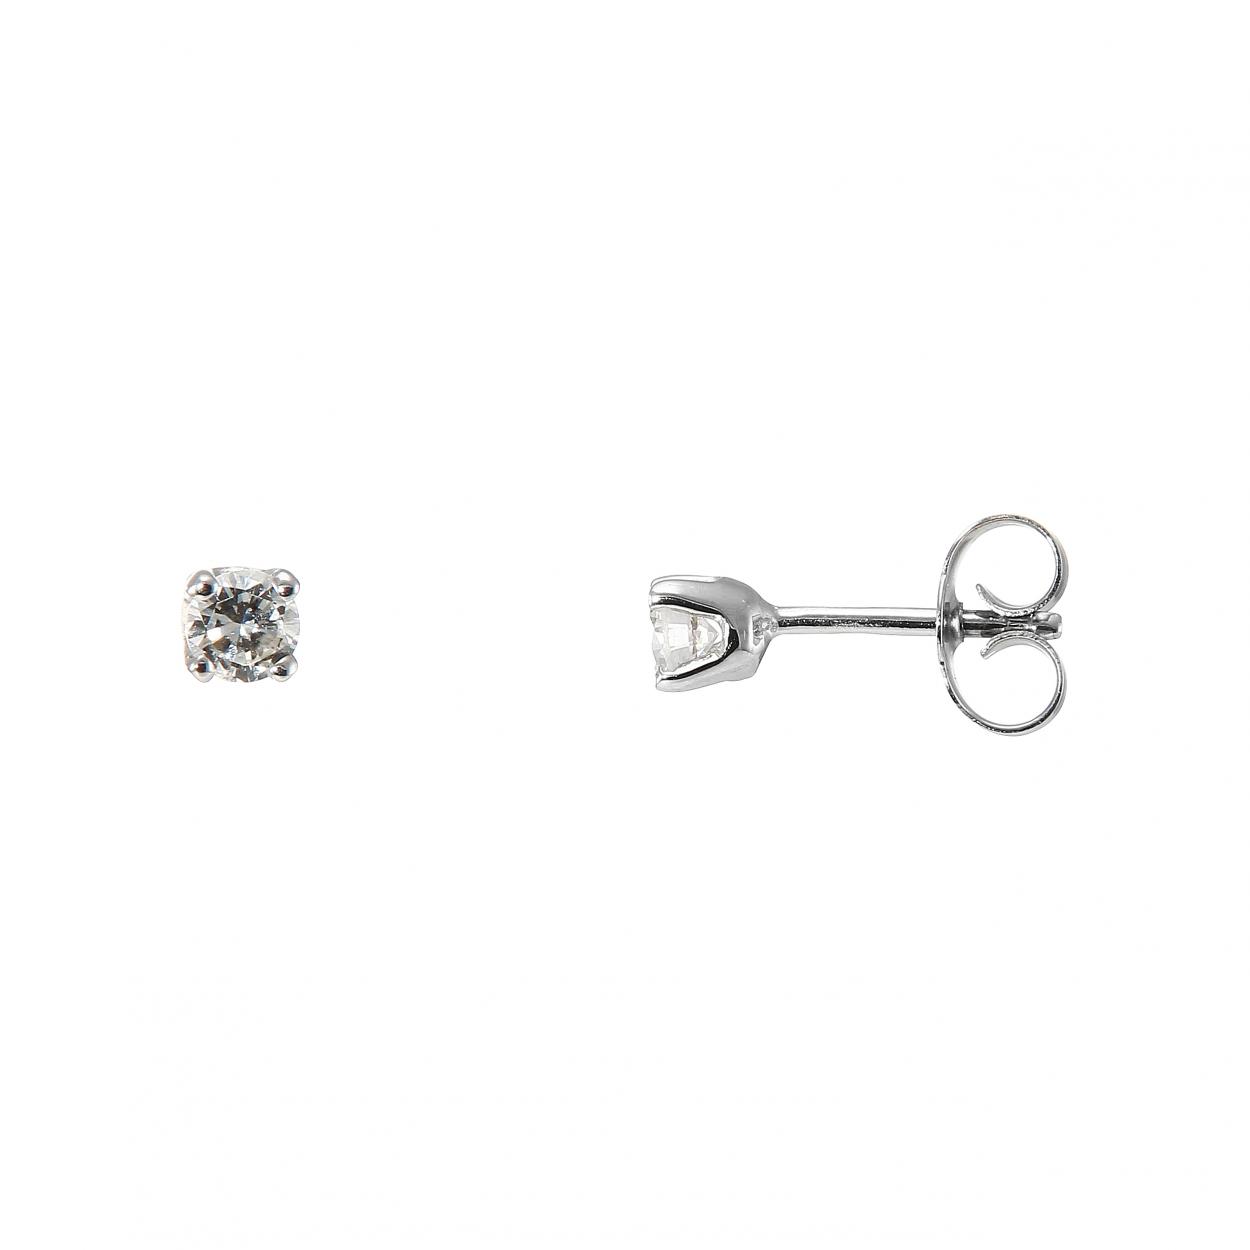 88baa09d3c5ca Boucles d oreilles Diamant 0.24 ct HSI Or Blanc Ref. 32150